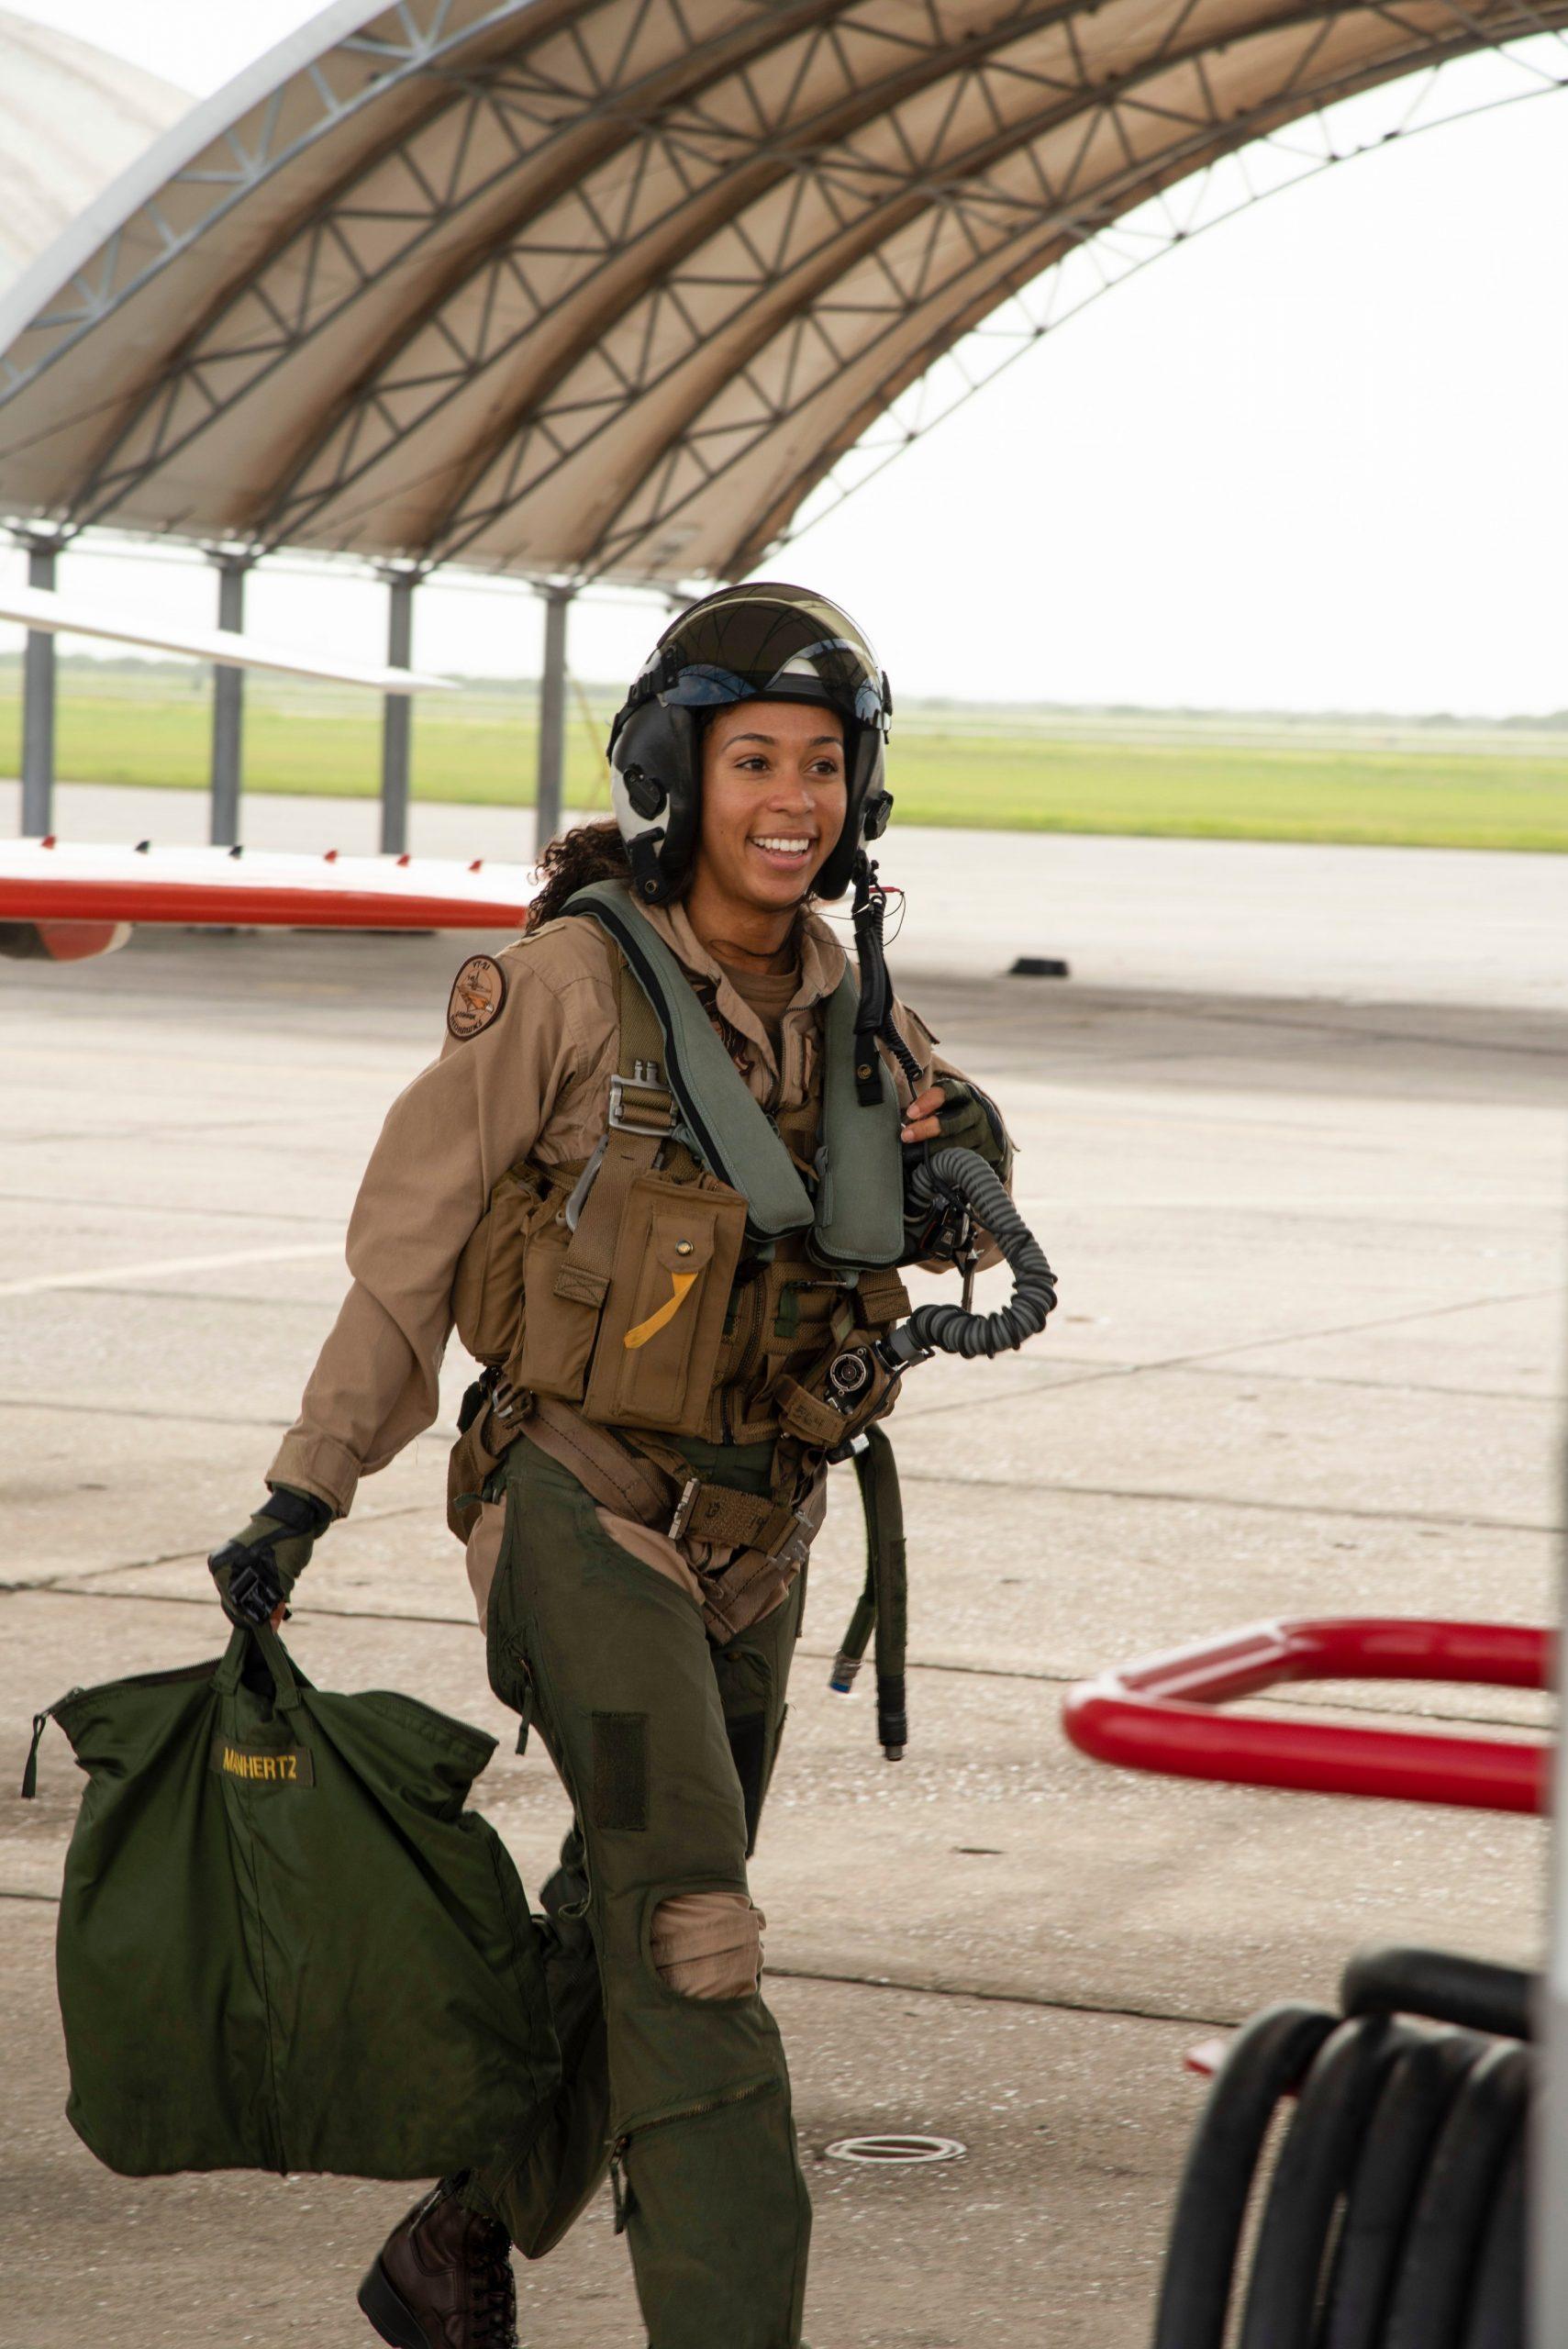 Lt. Madeline Swegle